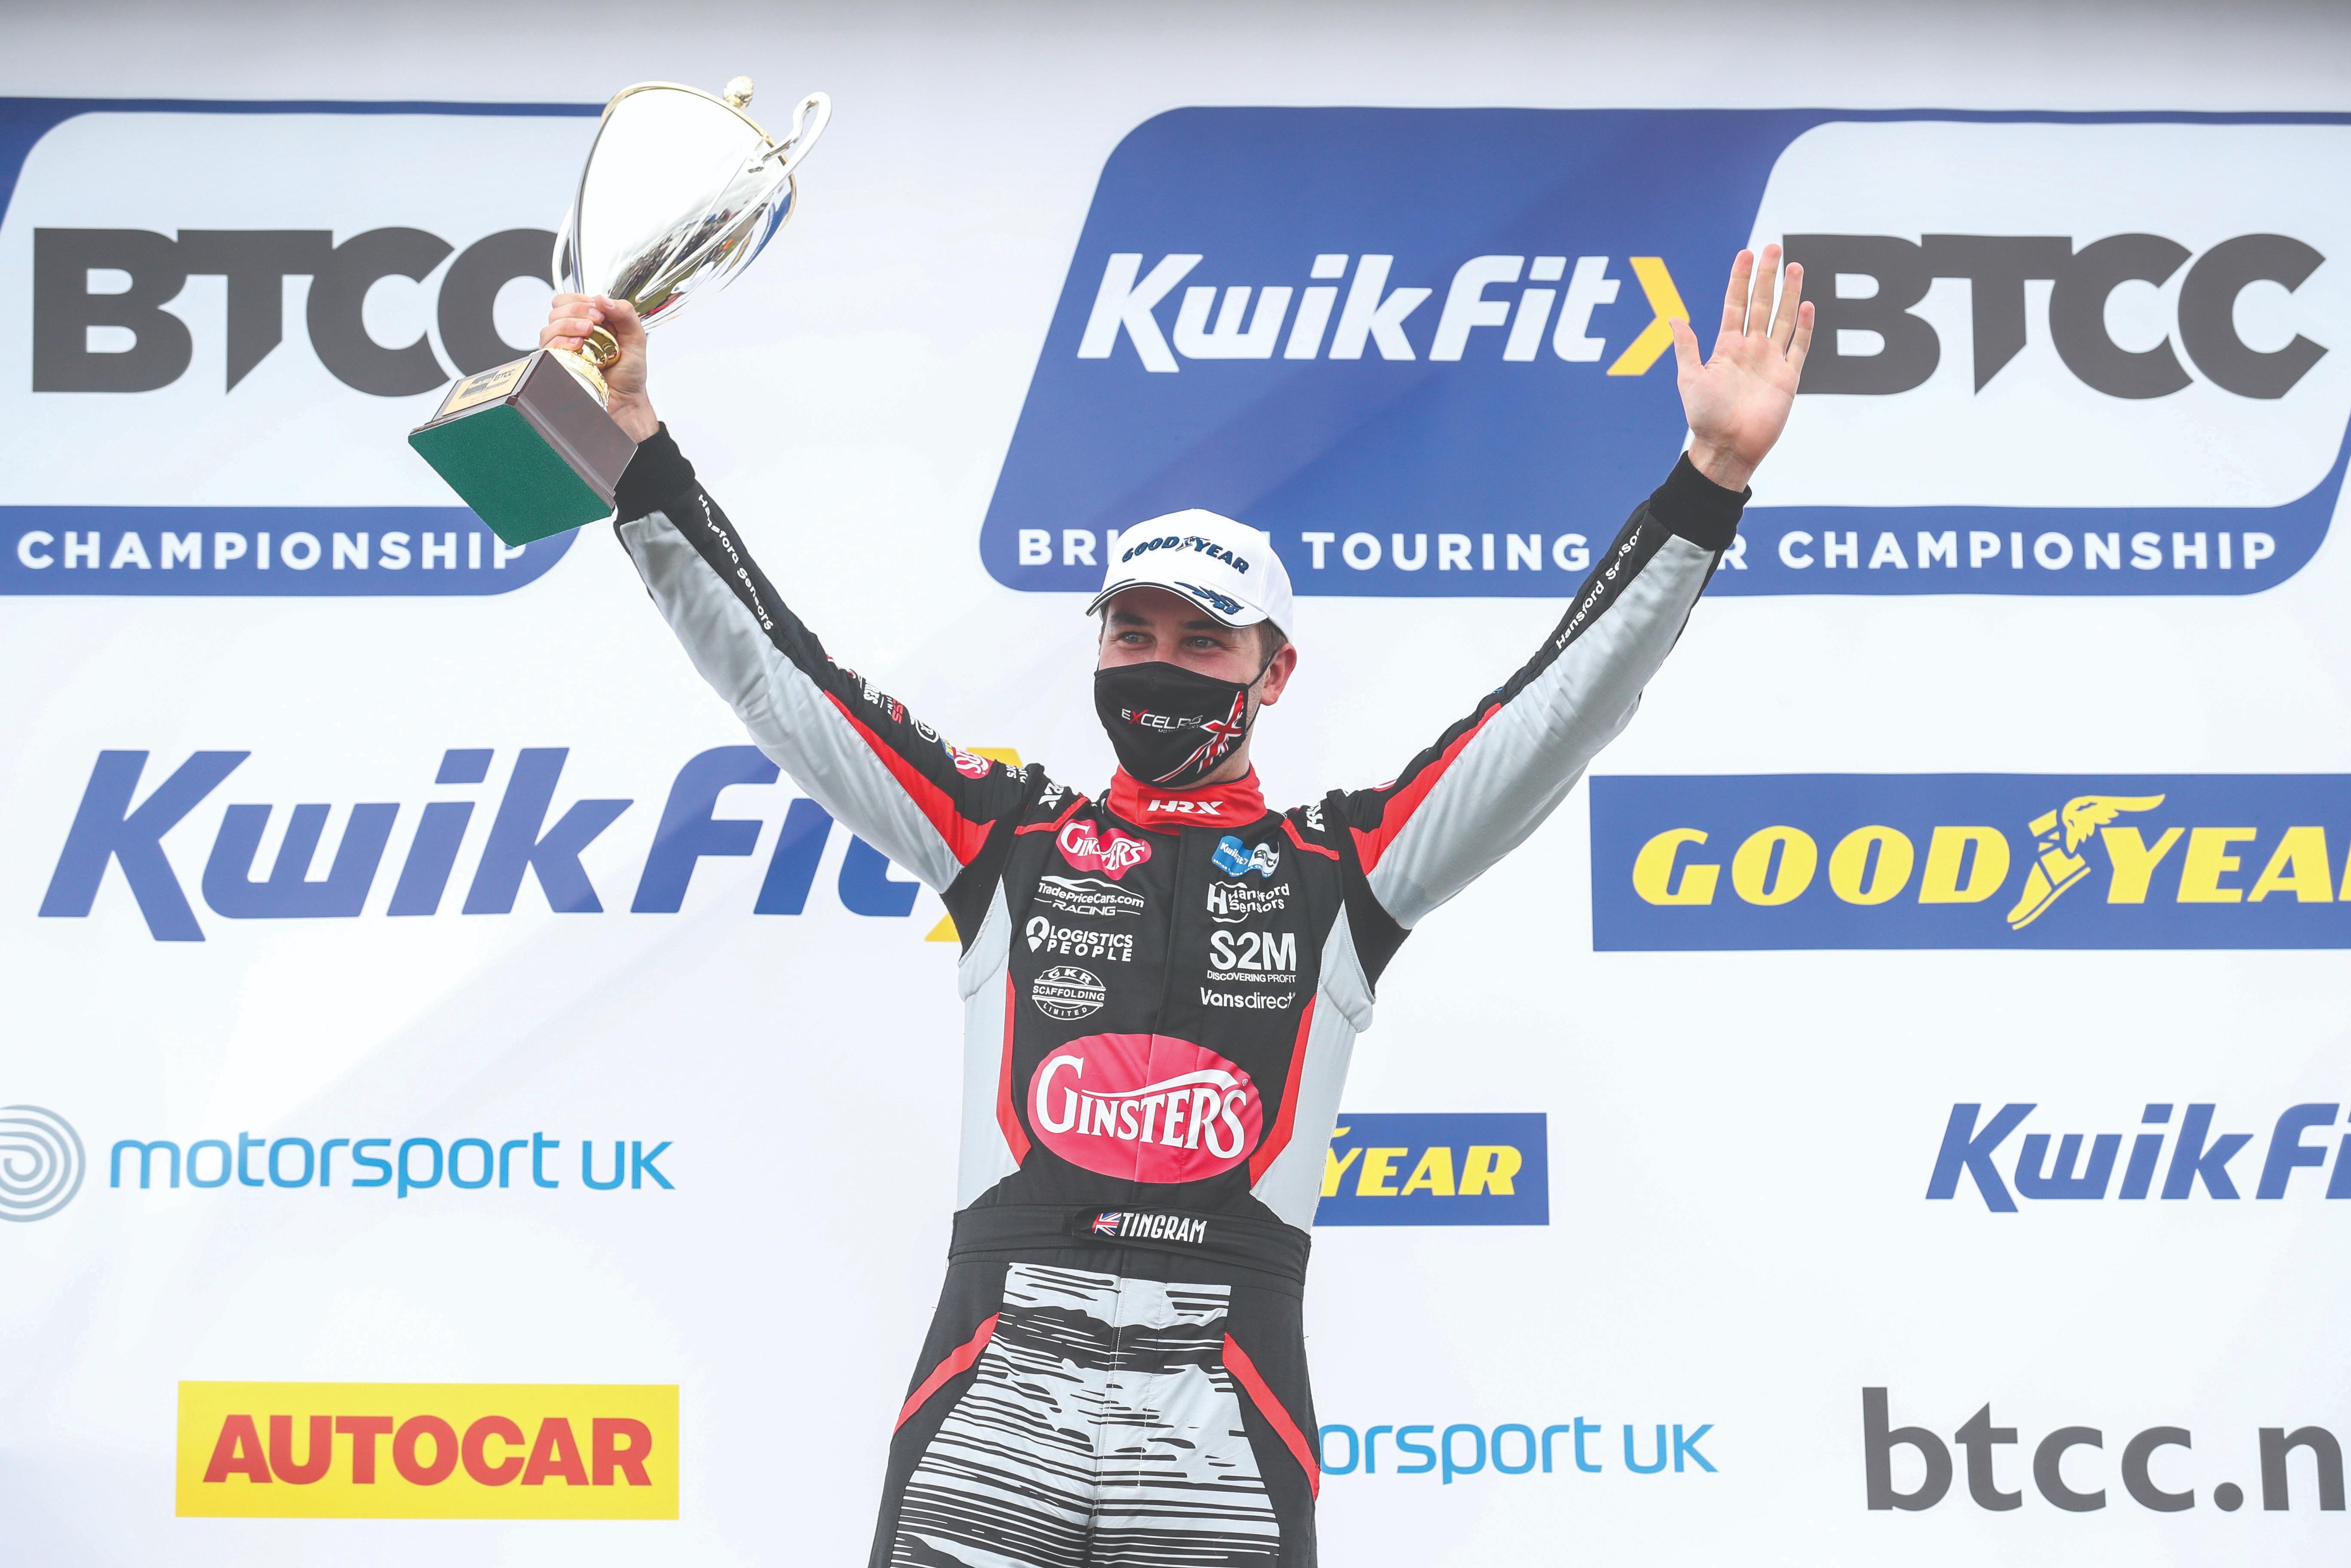 Tom Ingram is among the group of BTCC drivers now sporting HRX racewear